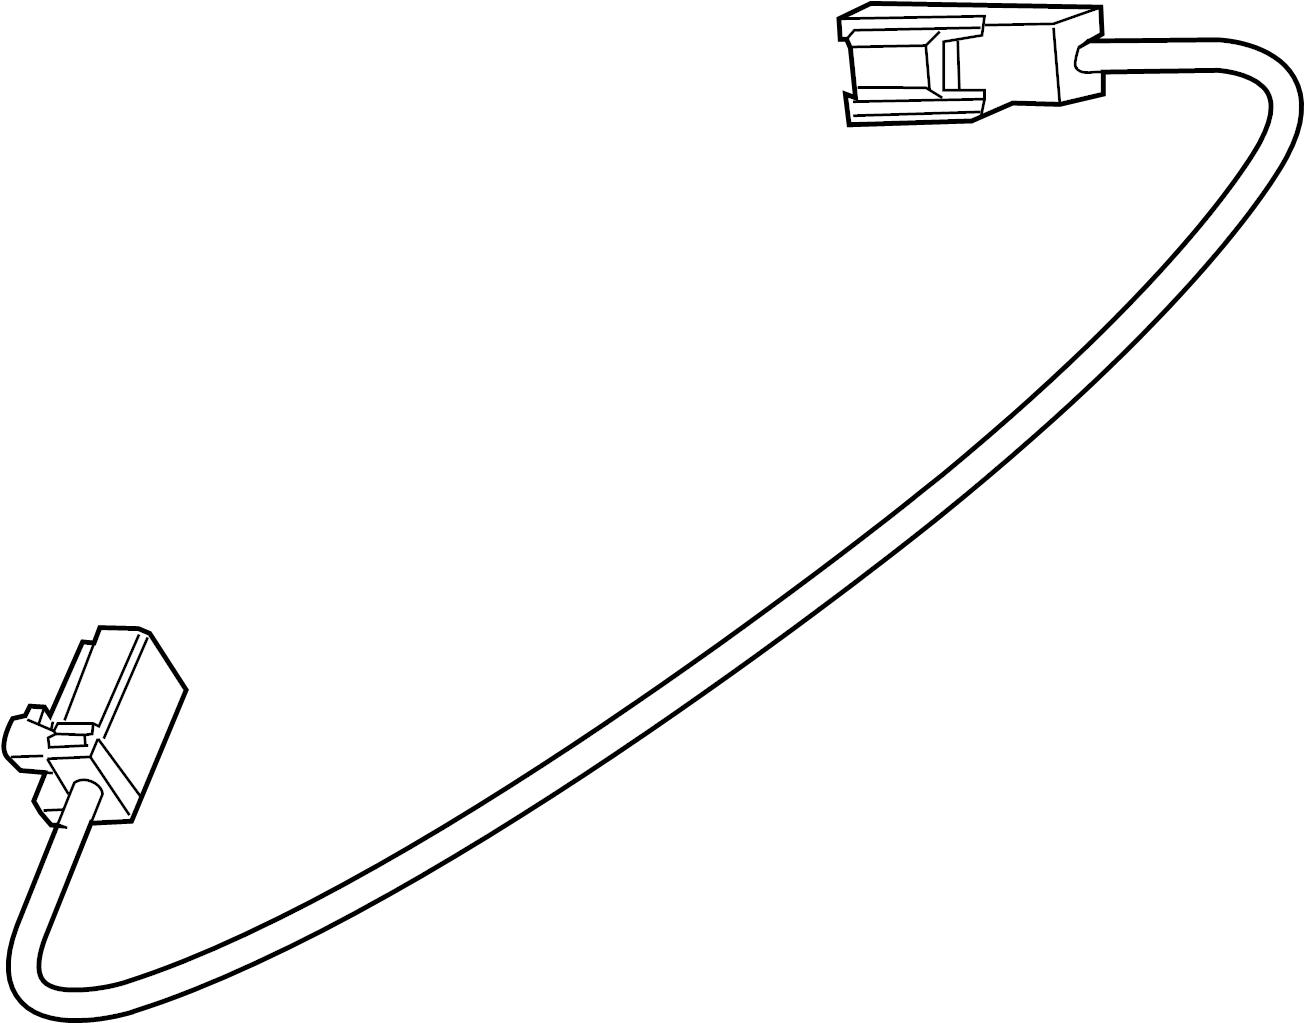 2004 jaguar xj8 radio wiring harness 2004 nissan maxima radio wiring diagram